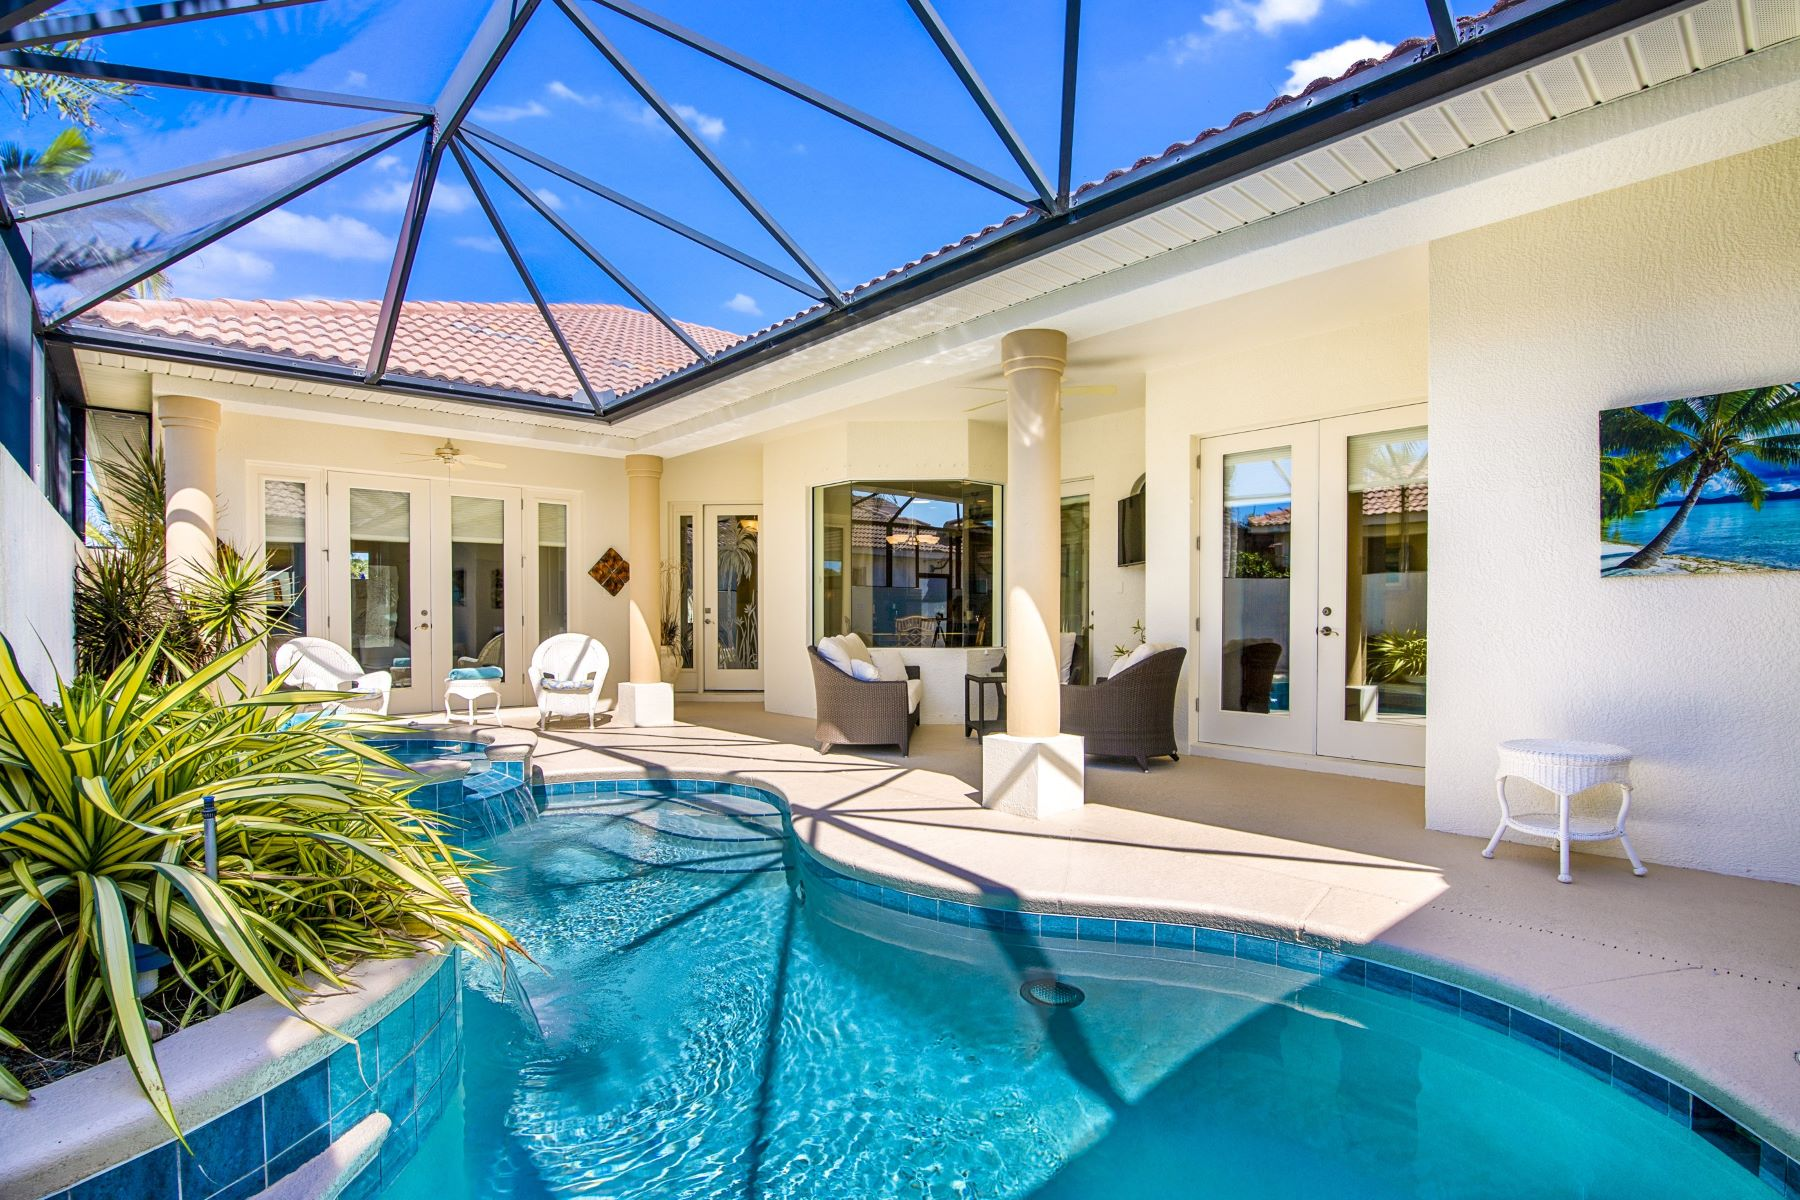 for Sale at 849 Aquarina Boulevard Melbourne Beach, Florida 32951 United States